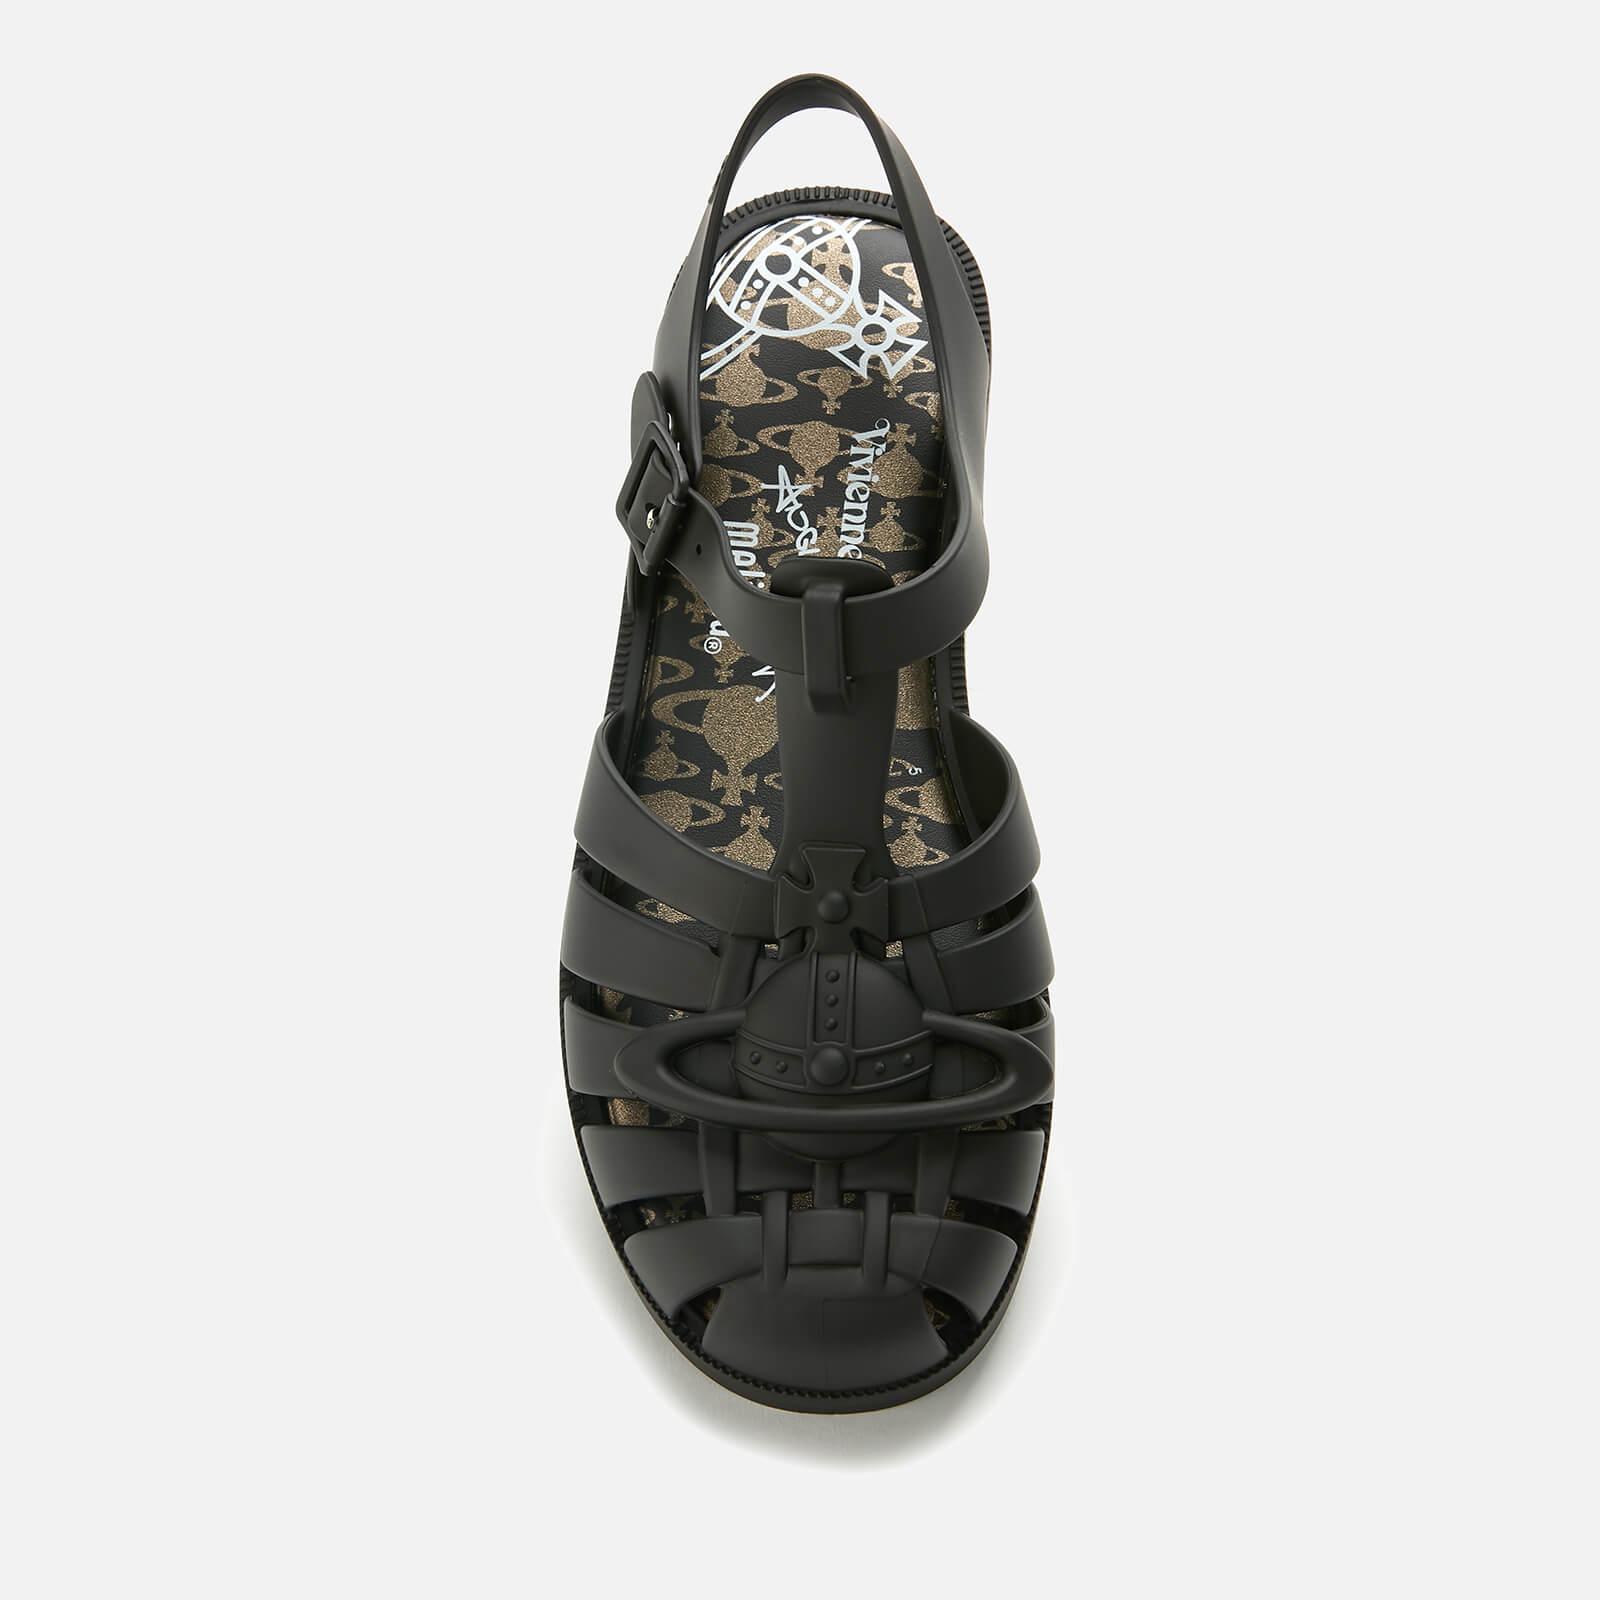 Vivienne Westwood for Melissa Women's Possession Flat Sandals - Black Matt Orb